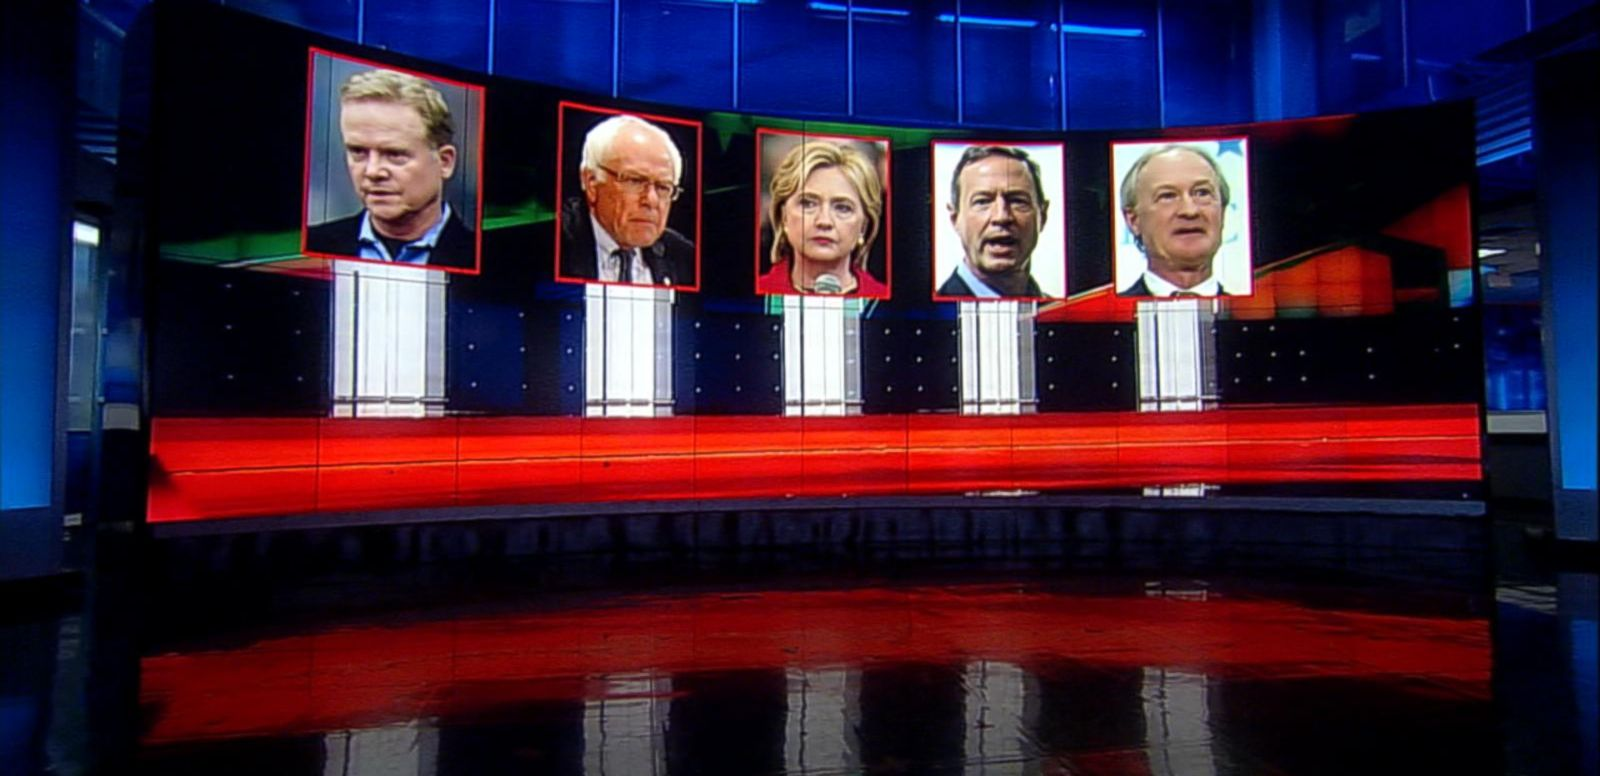 VIDEO: Vegas Showdown: Democratic Presidential Contenders Debate